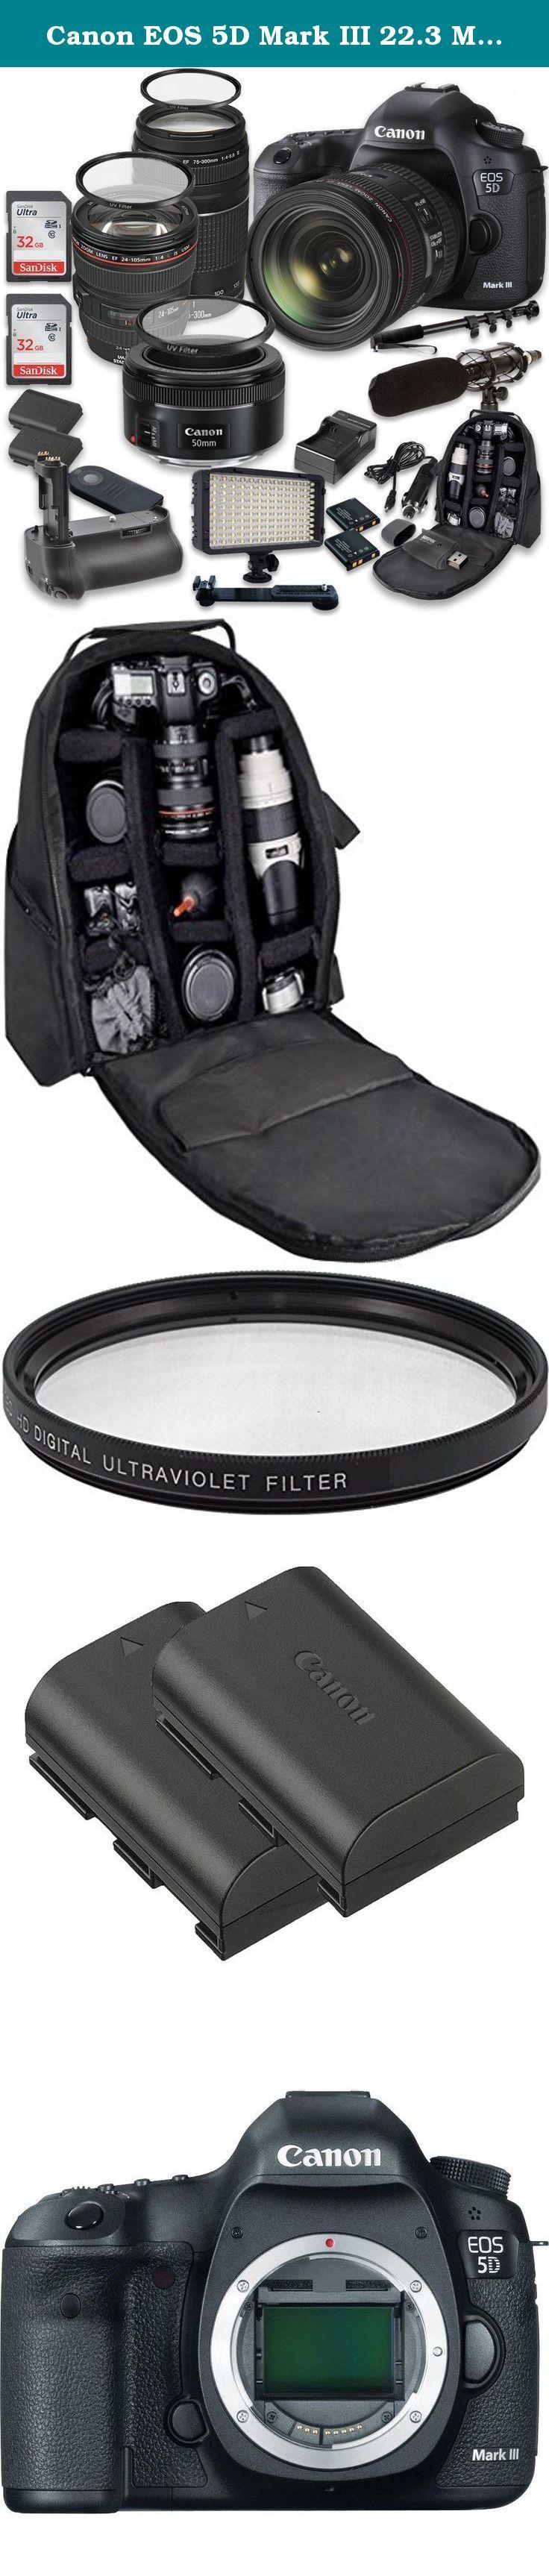 Canon EOS 5D Mark III 22.3 MP Full Frame CMOS Sensor Digital SLR Camera w/ EF 24-105mm f/4 L IS USM Lens + Tamron AF 70-300mm f/4.0-5.6 + EF 50mm f/1.8 STM Lens + Holiday Accessory Bundle. This 33rd Street Camera Digital SLR Camera Bundle Includes: Canon EOS 5D Mark III 22.3 MP Full Frame CMOS Sensor Digital SLR DSLR Camera Canon EF 24-105mm f/4 L IS USM Lens Tamron Auto Focus 70-300mm f/4.0-5.6 Di LD Macro Zoom Canon EF 50mm f/1.8 STM Lens Vertical Multi-Power Battery Grip 2 Pieces…